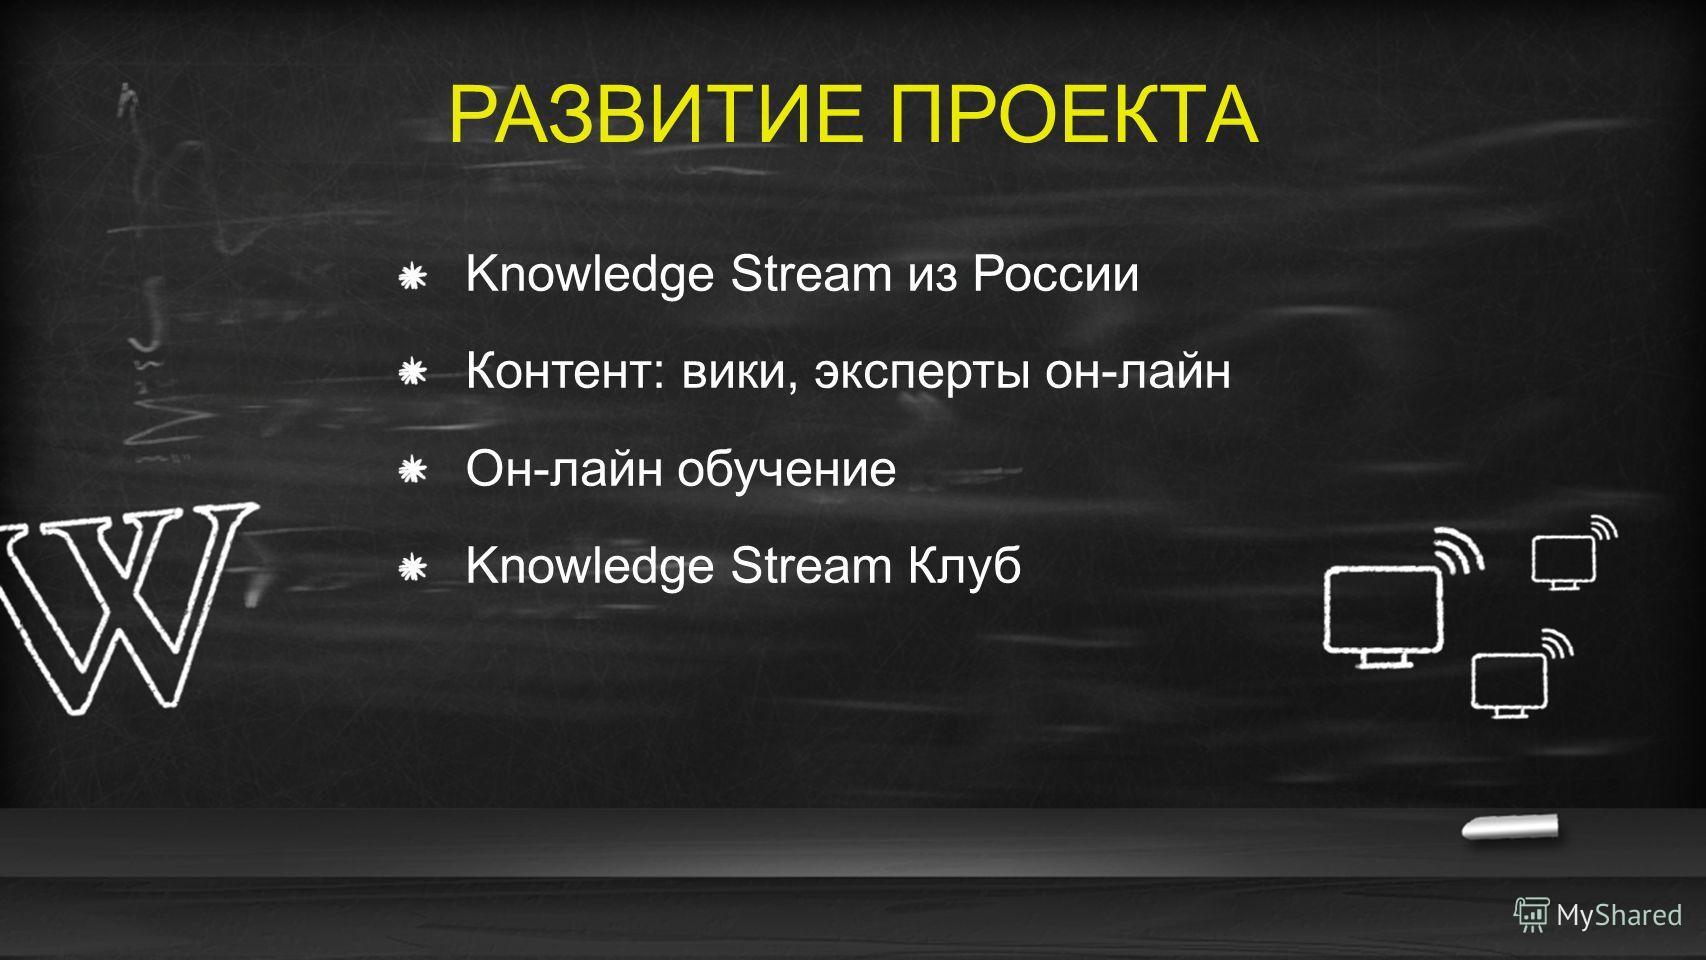 РАЗВИТИЕ ПРОЕКТА Knowledge Stream из России Контент: вики, эксперты он-лайн Он-лайн обучение Knowledge Stream Клуб